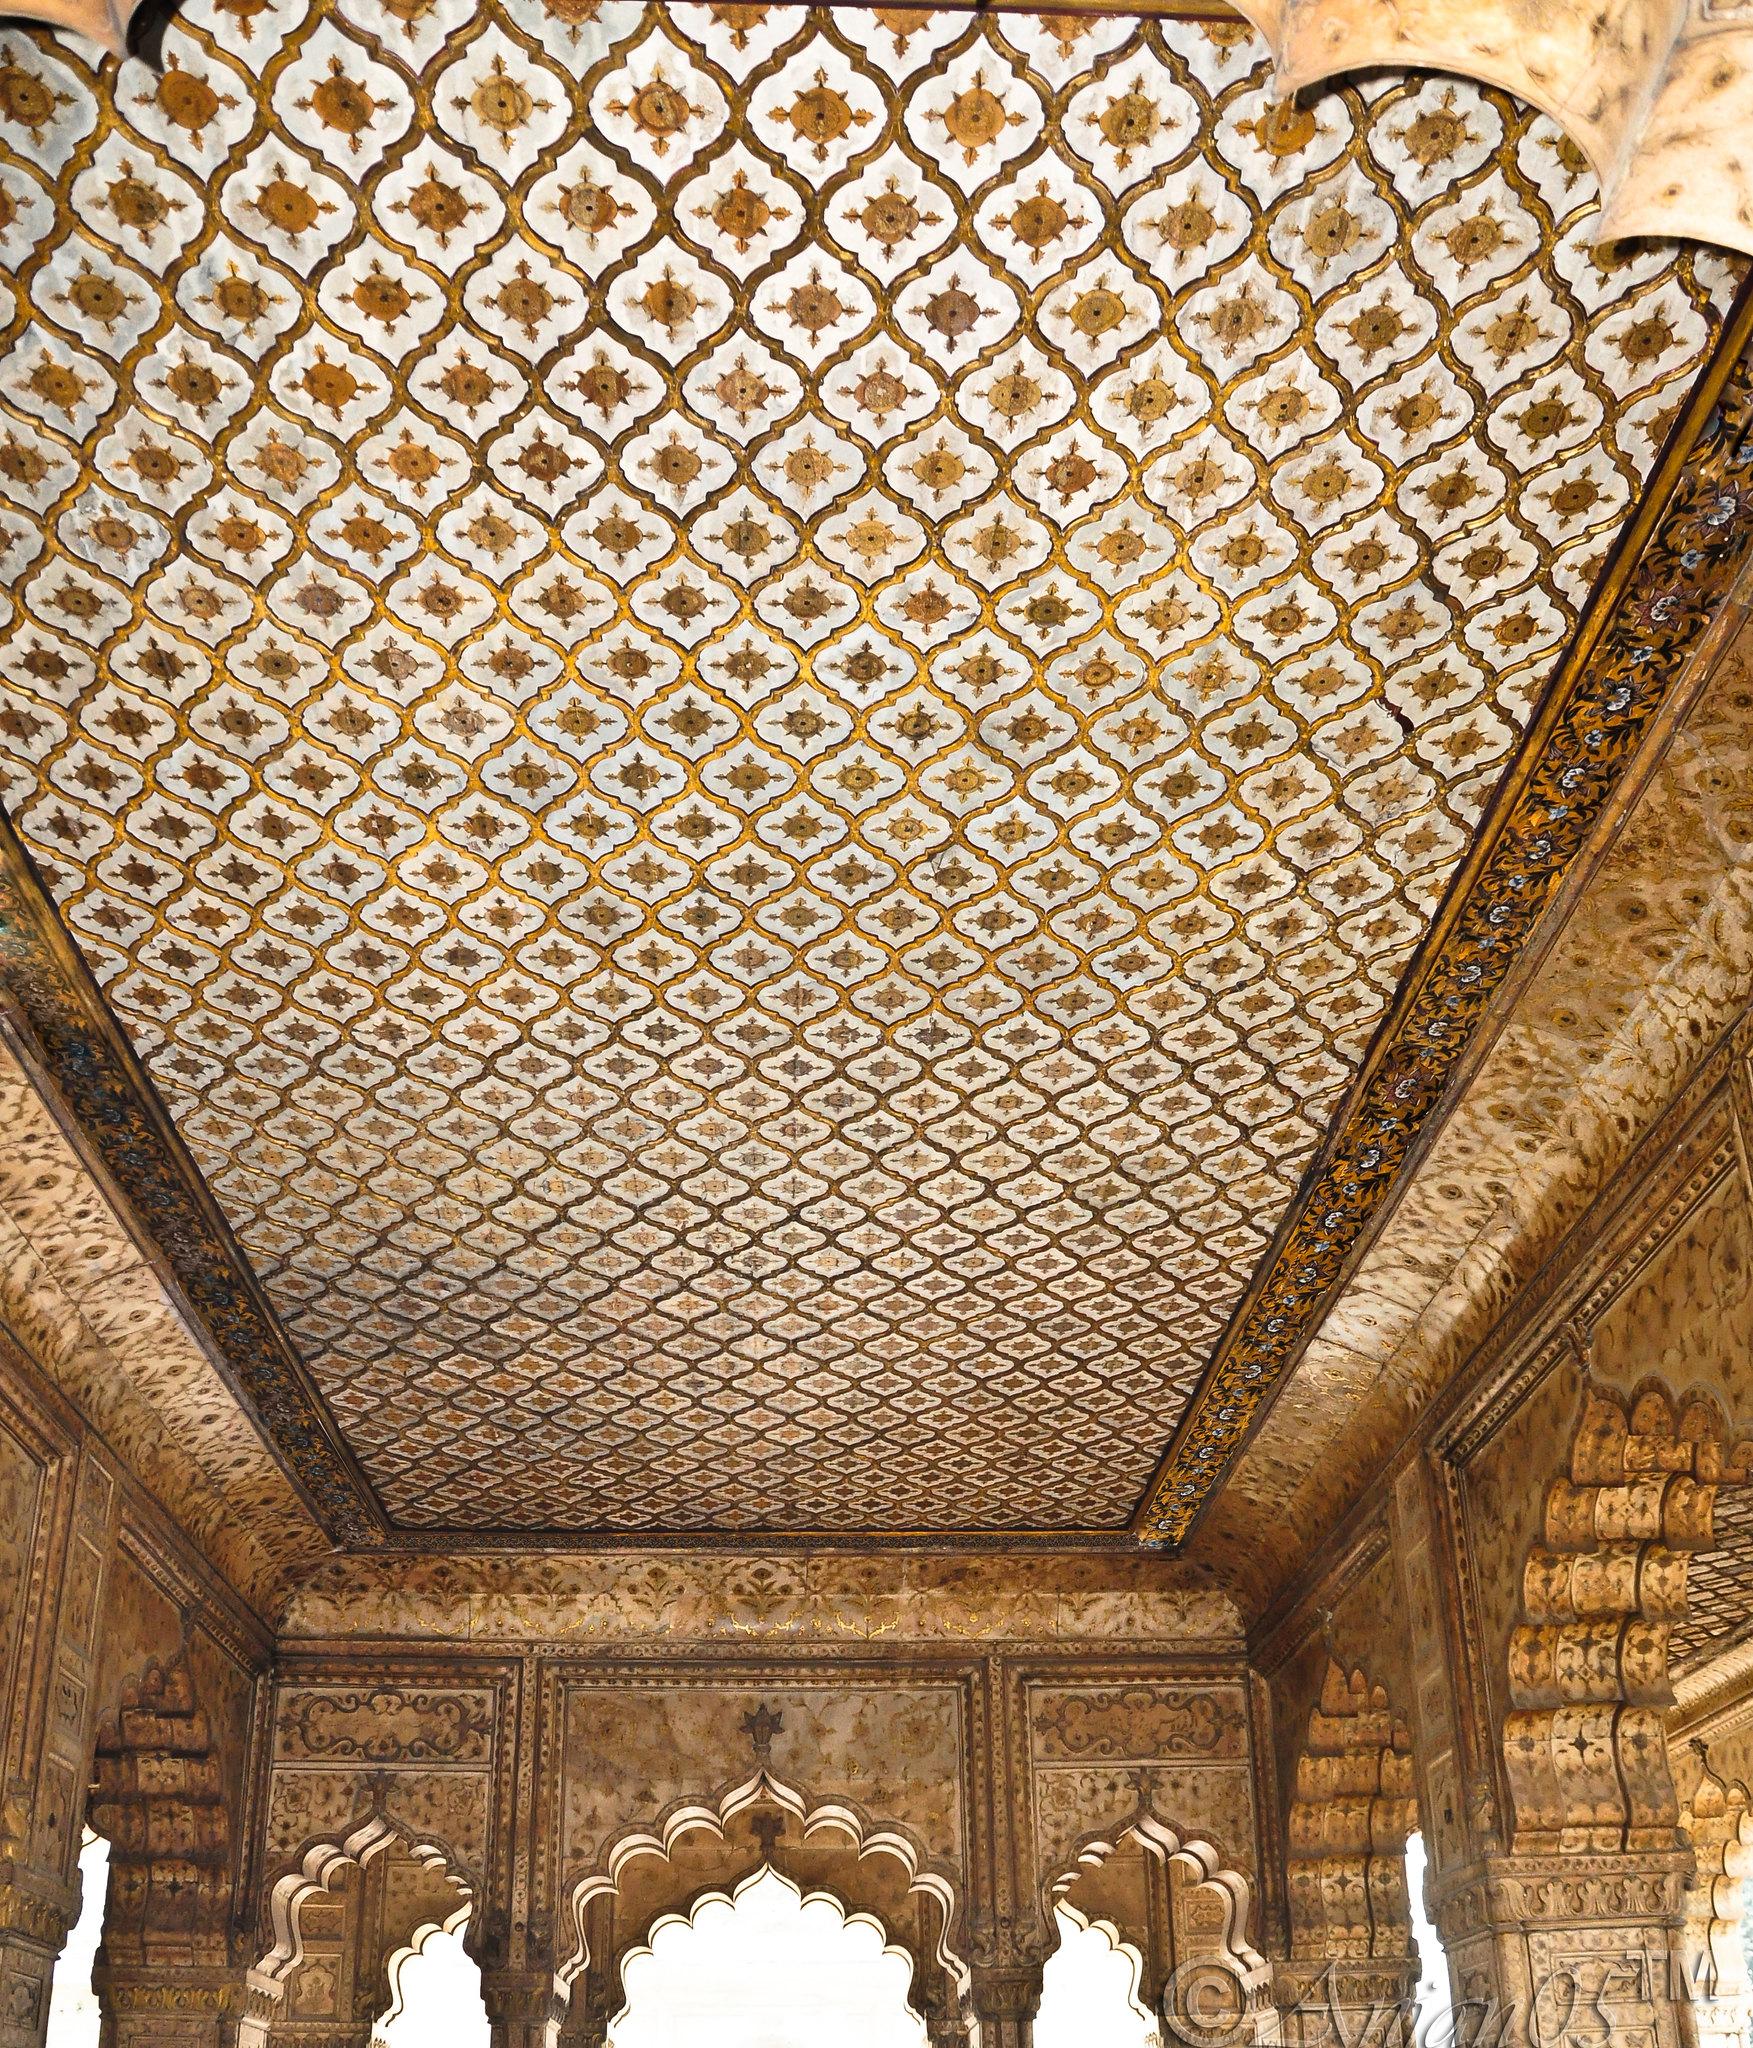 Walls & Ceilings inside Diwan-i-Khas - Red Fort -Delhi - India